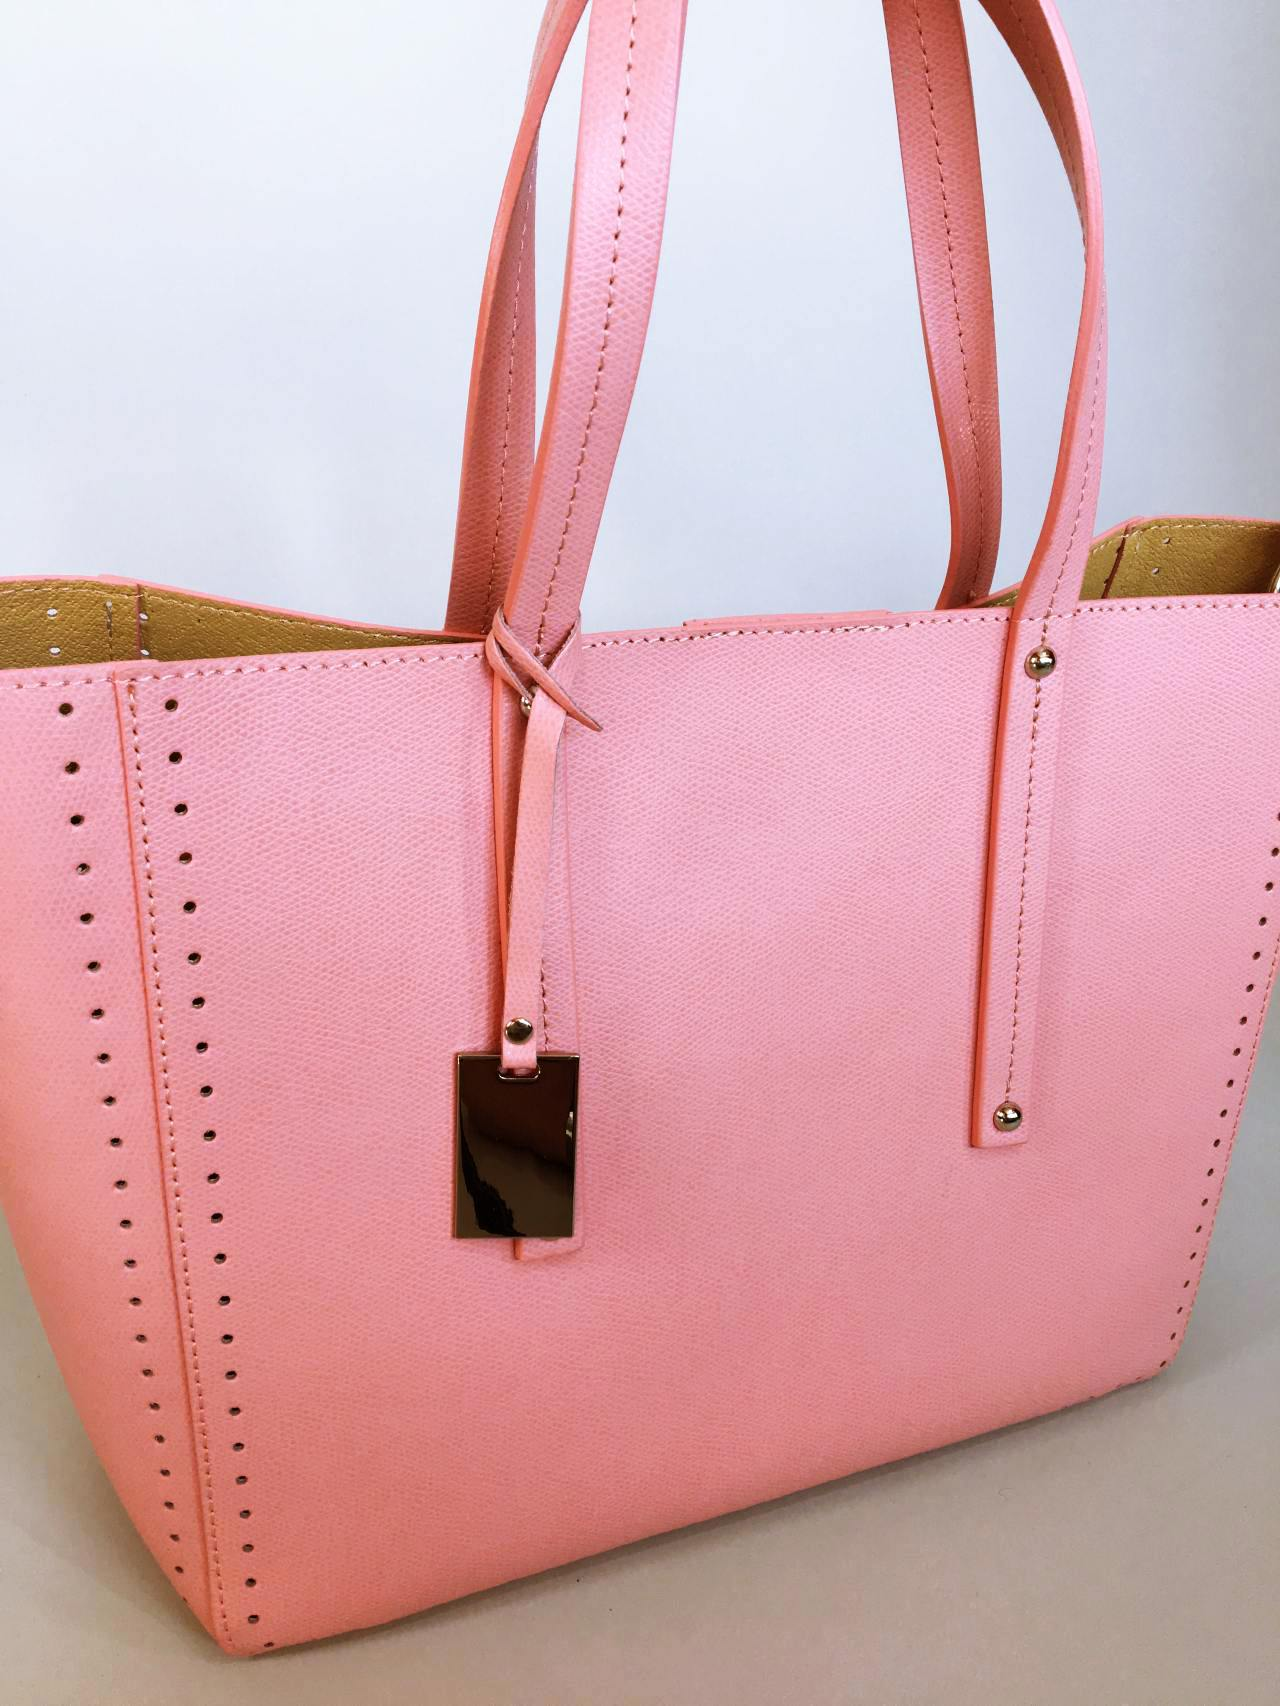 Kožená kabelka Bia růžová 02